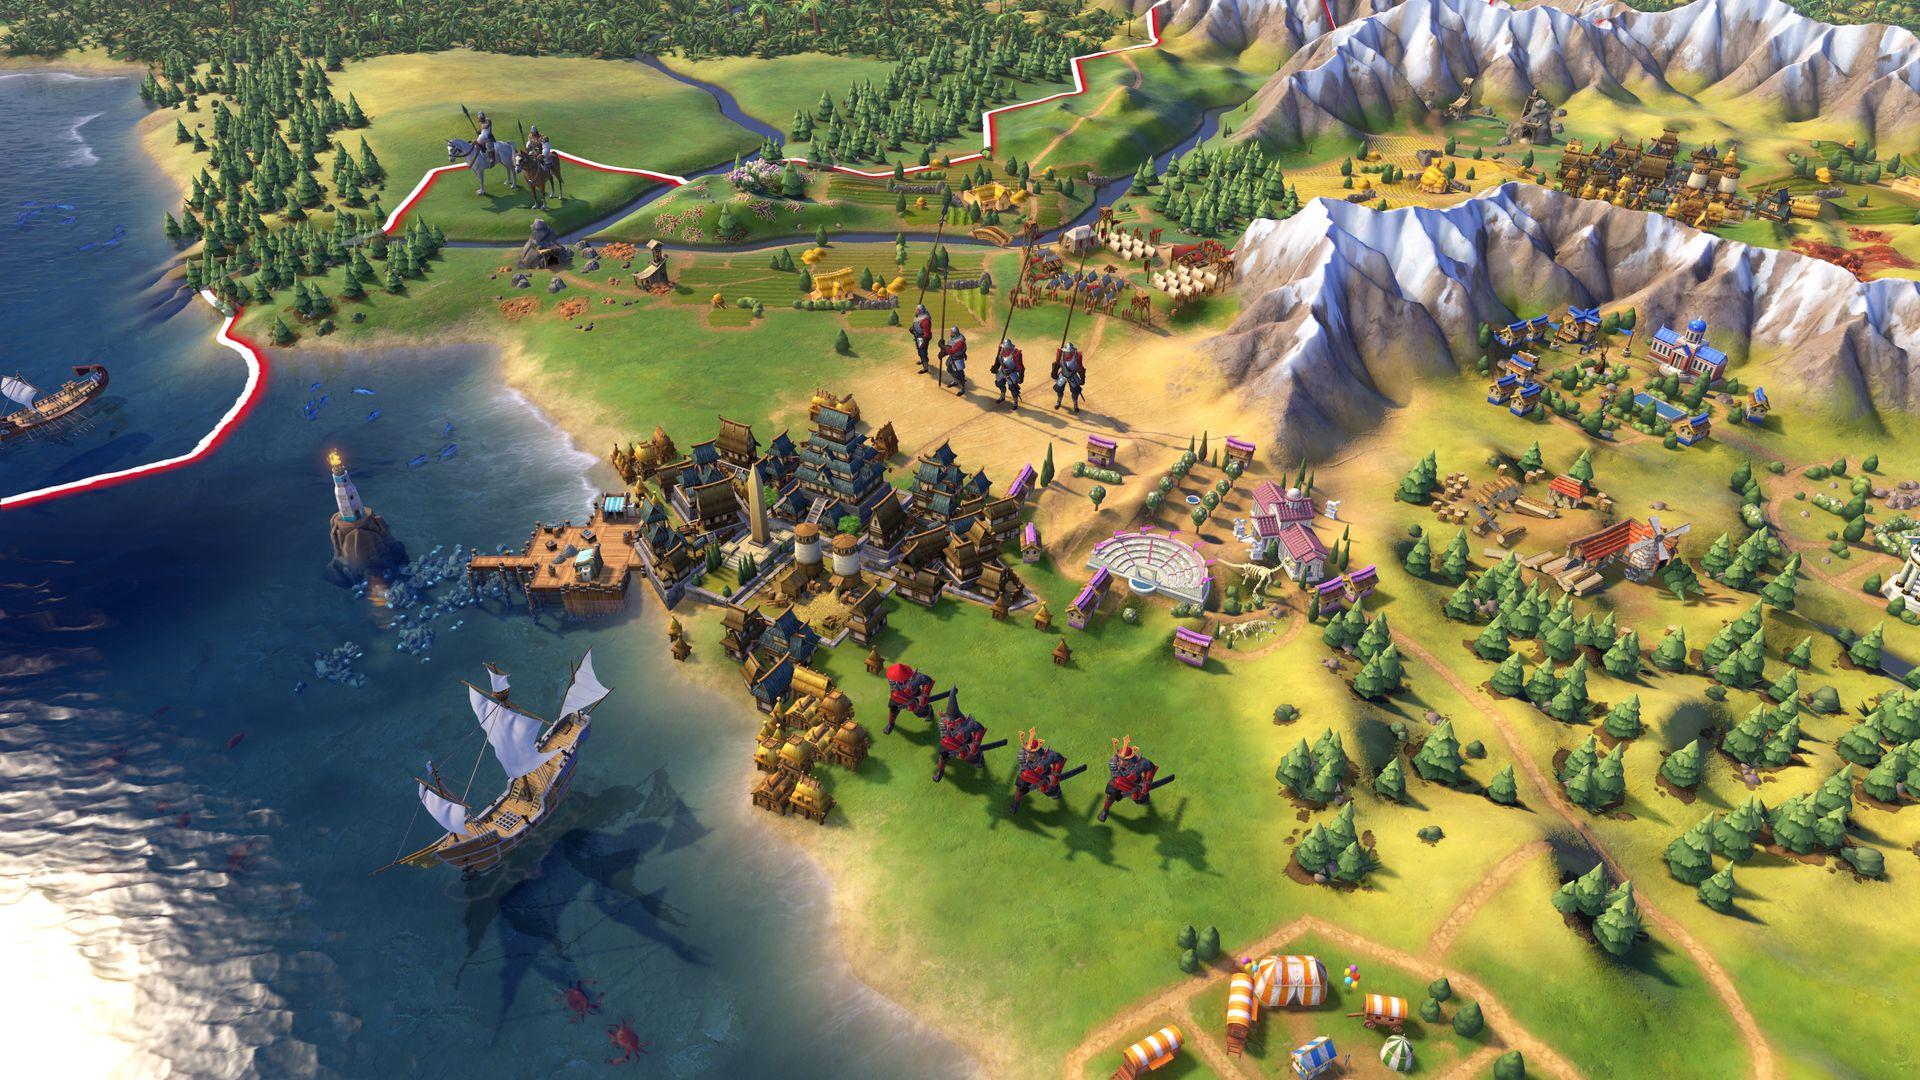 sid-meiers-civilization-vi-screenshot-14